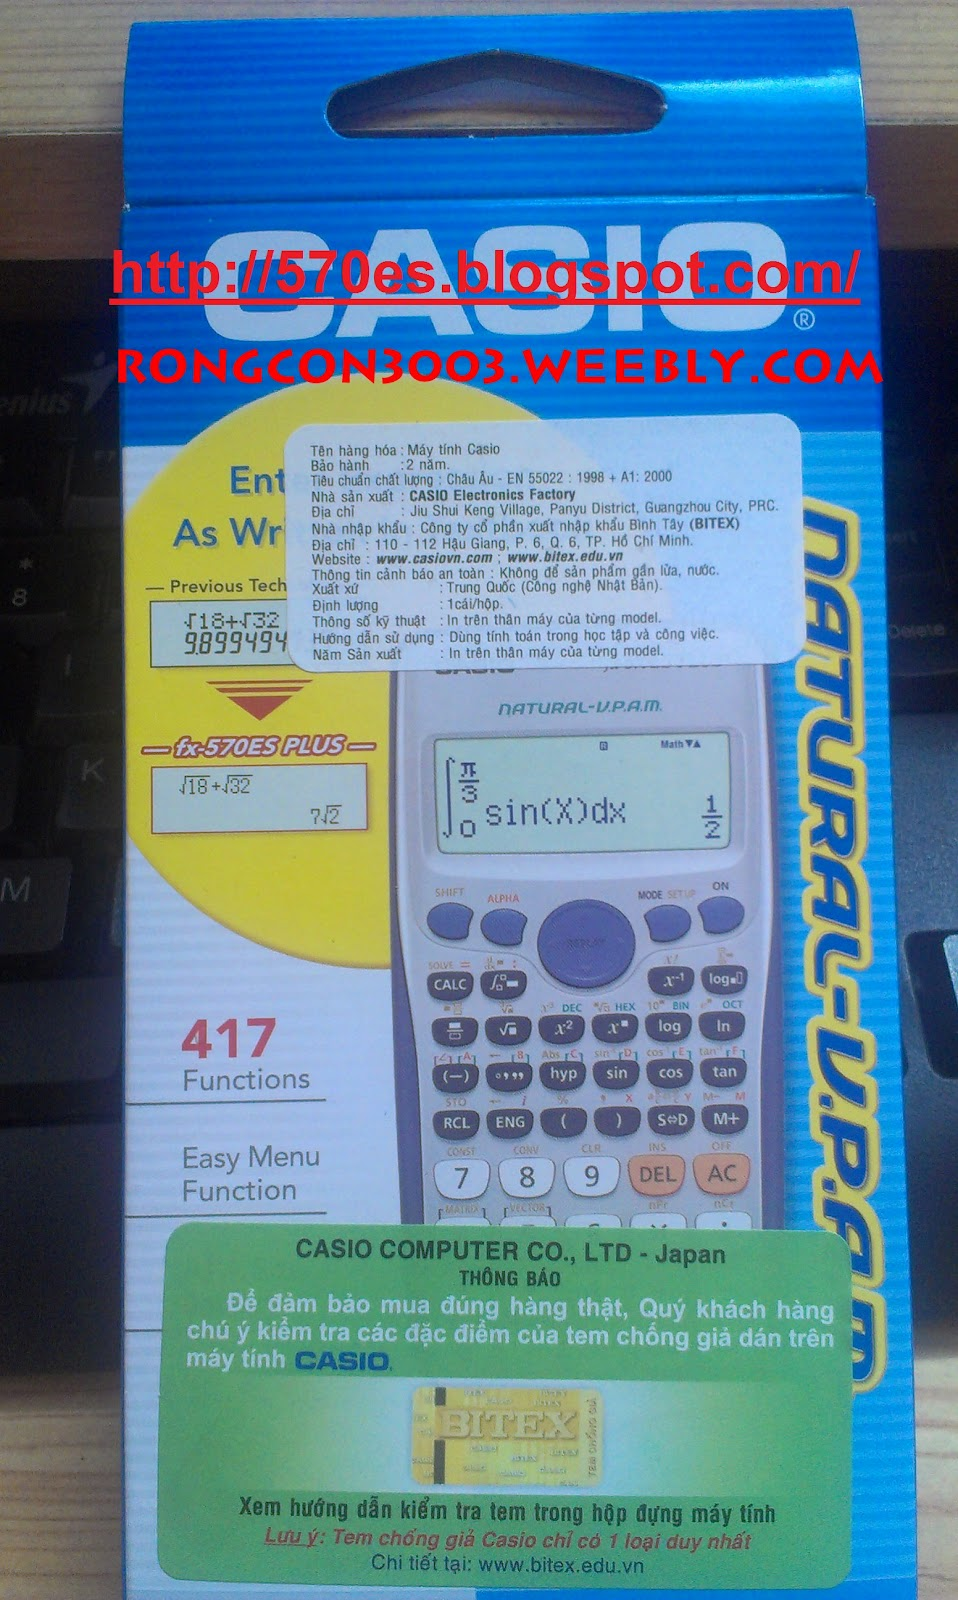 Bn My Tnh Hc Sinh Casio Fx 570es Plus Chnh Hng Scientific Calculator Sau Khi Thanh Ton Vui Lng Pm Vo Nick Ym Rongcon3003 A Ch Email Nhn Ngy Gi T Cm N Cc